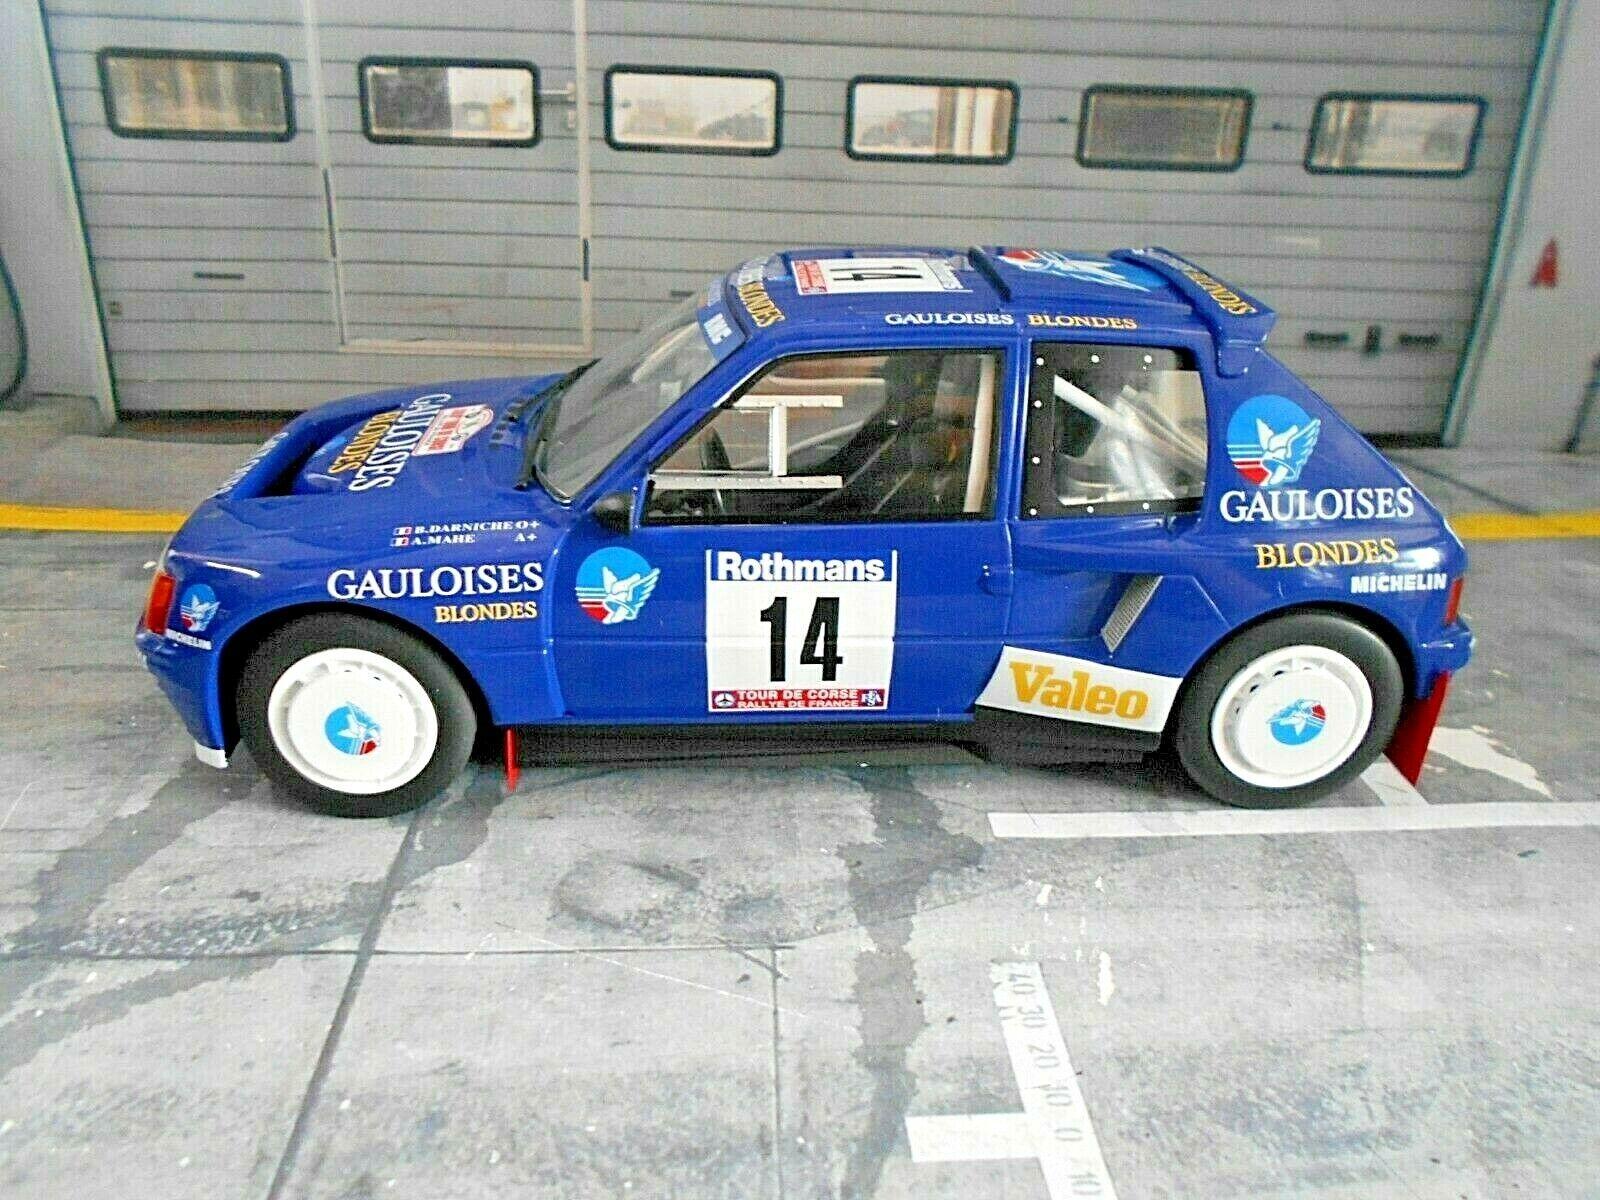 Peugeot 205 T16 Rallye Taille  B Tour de Corse 1985  14 Darniche Gauloises IXO 1 18  bon prix